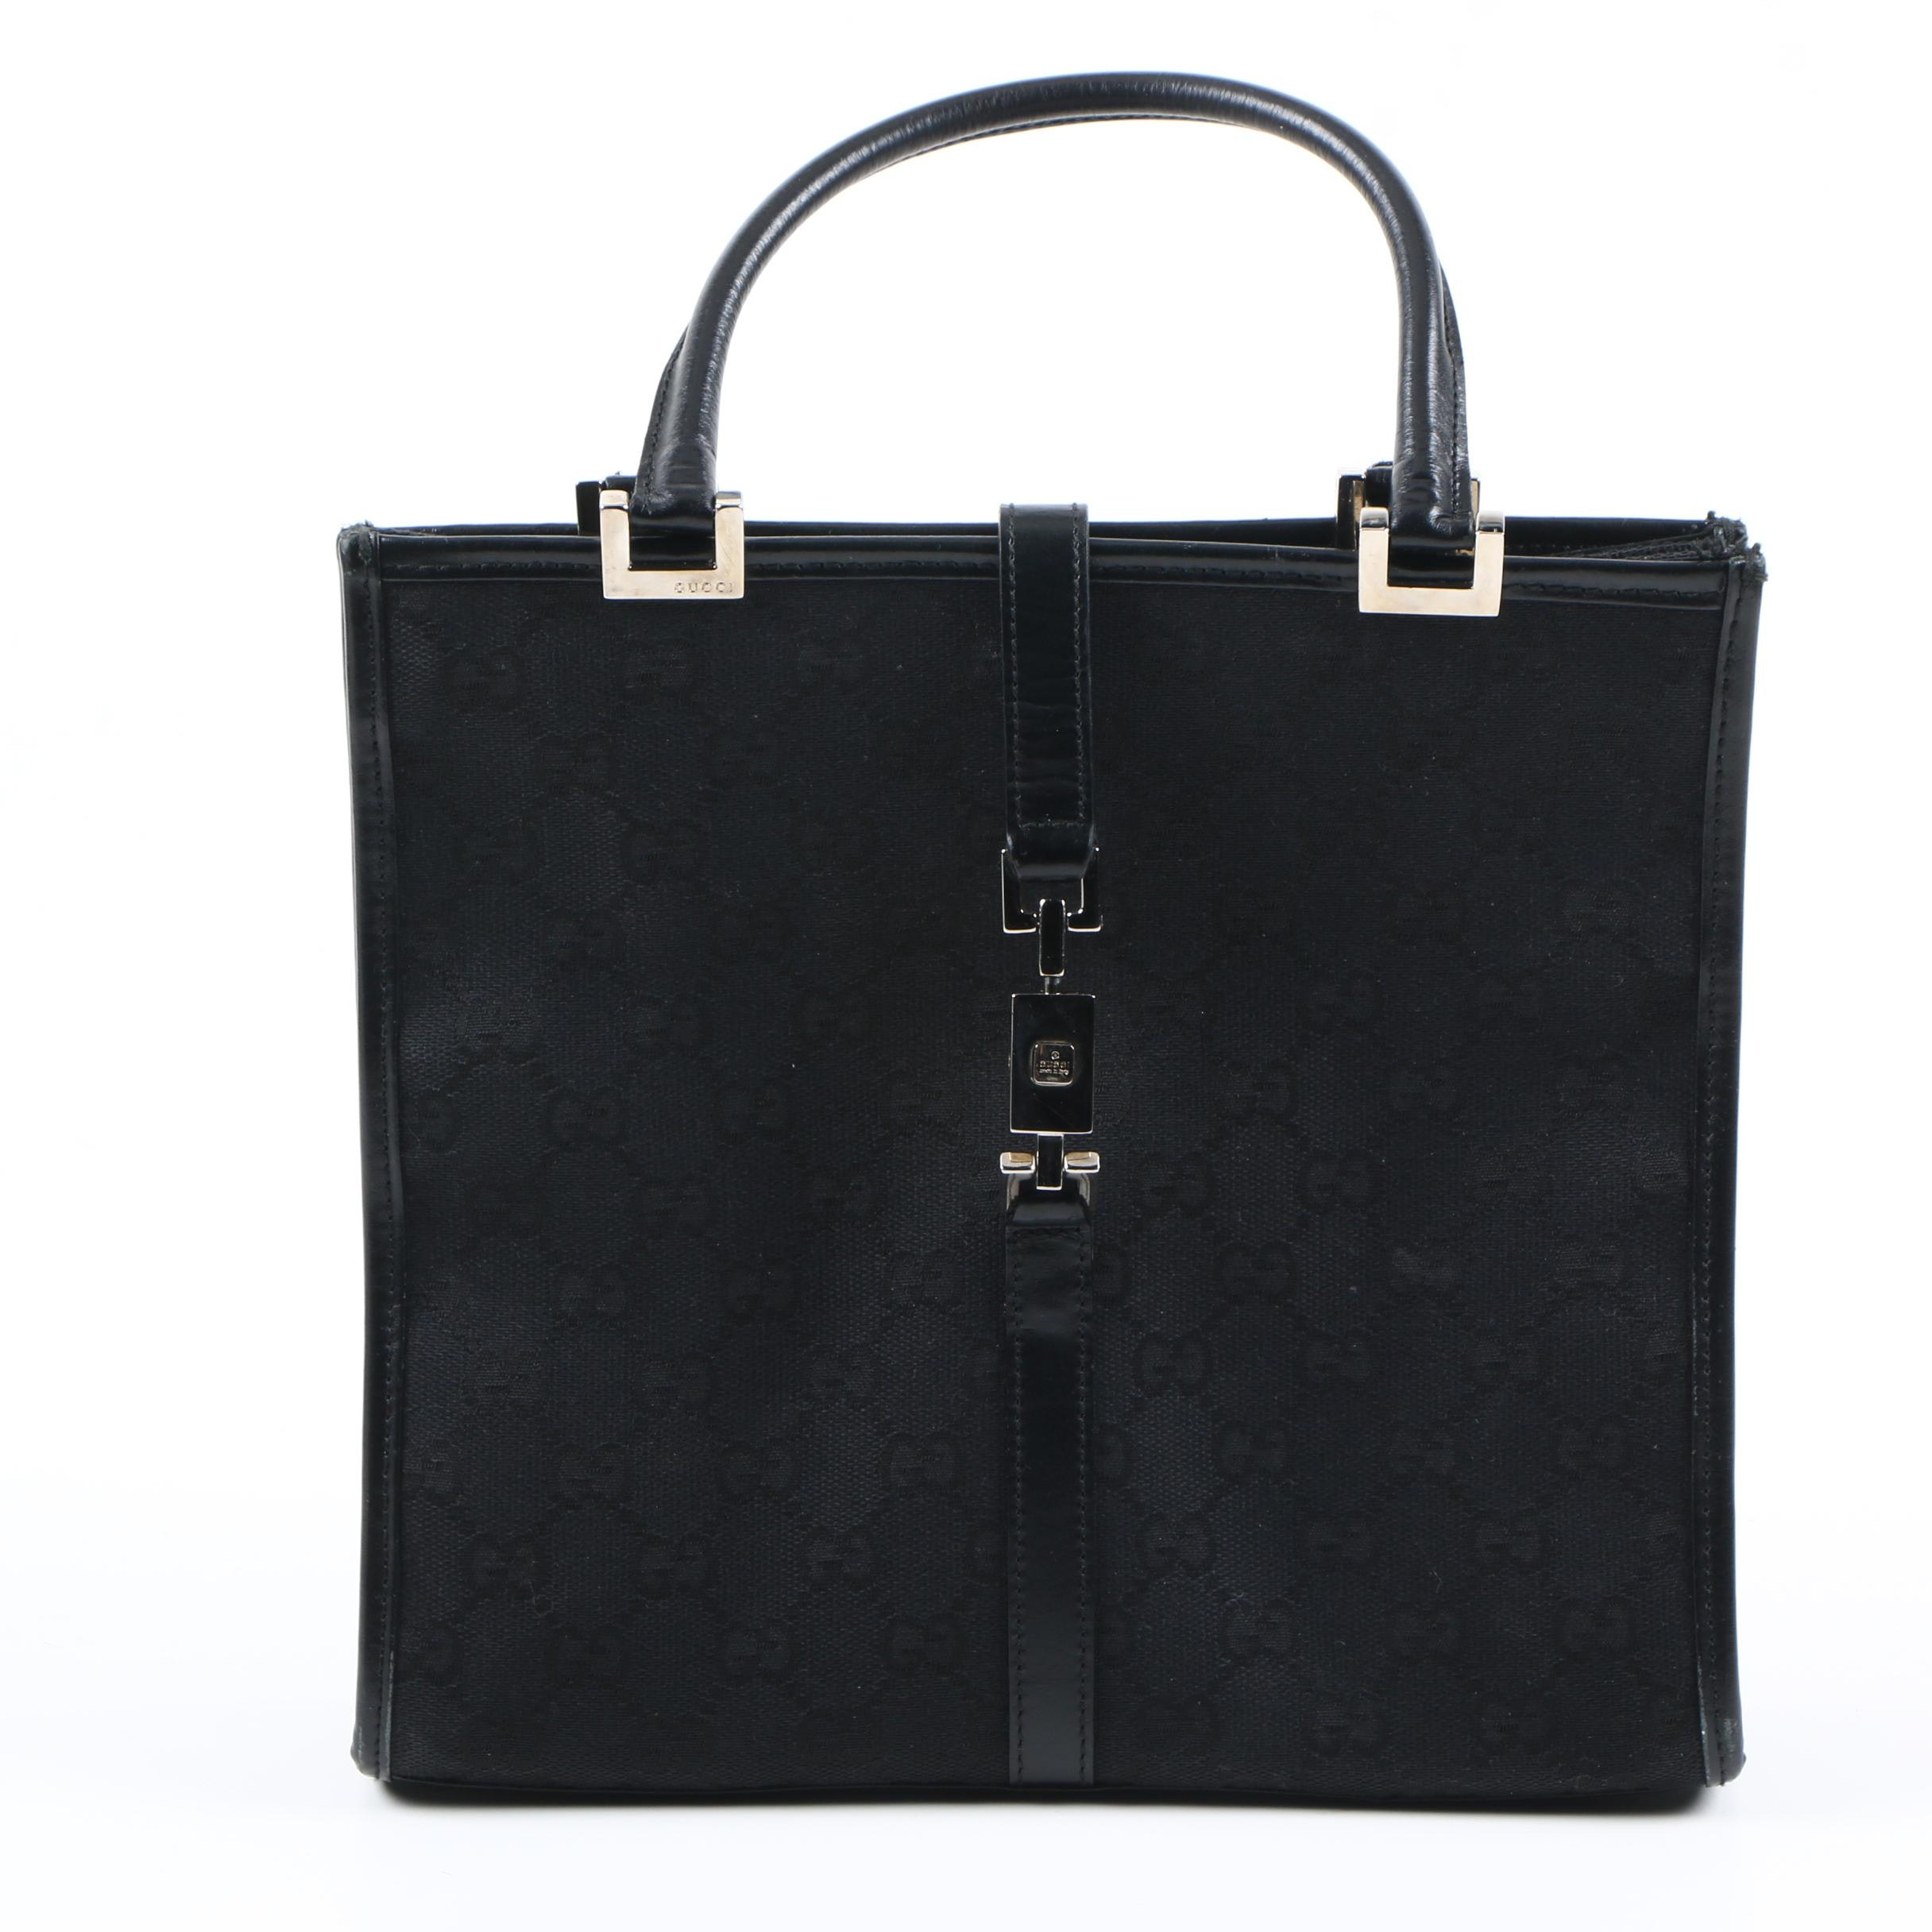 Gucci Black GG Canvas Handbag